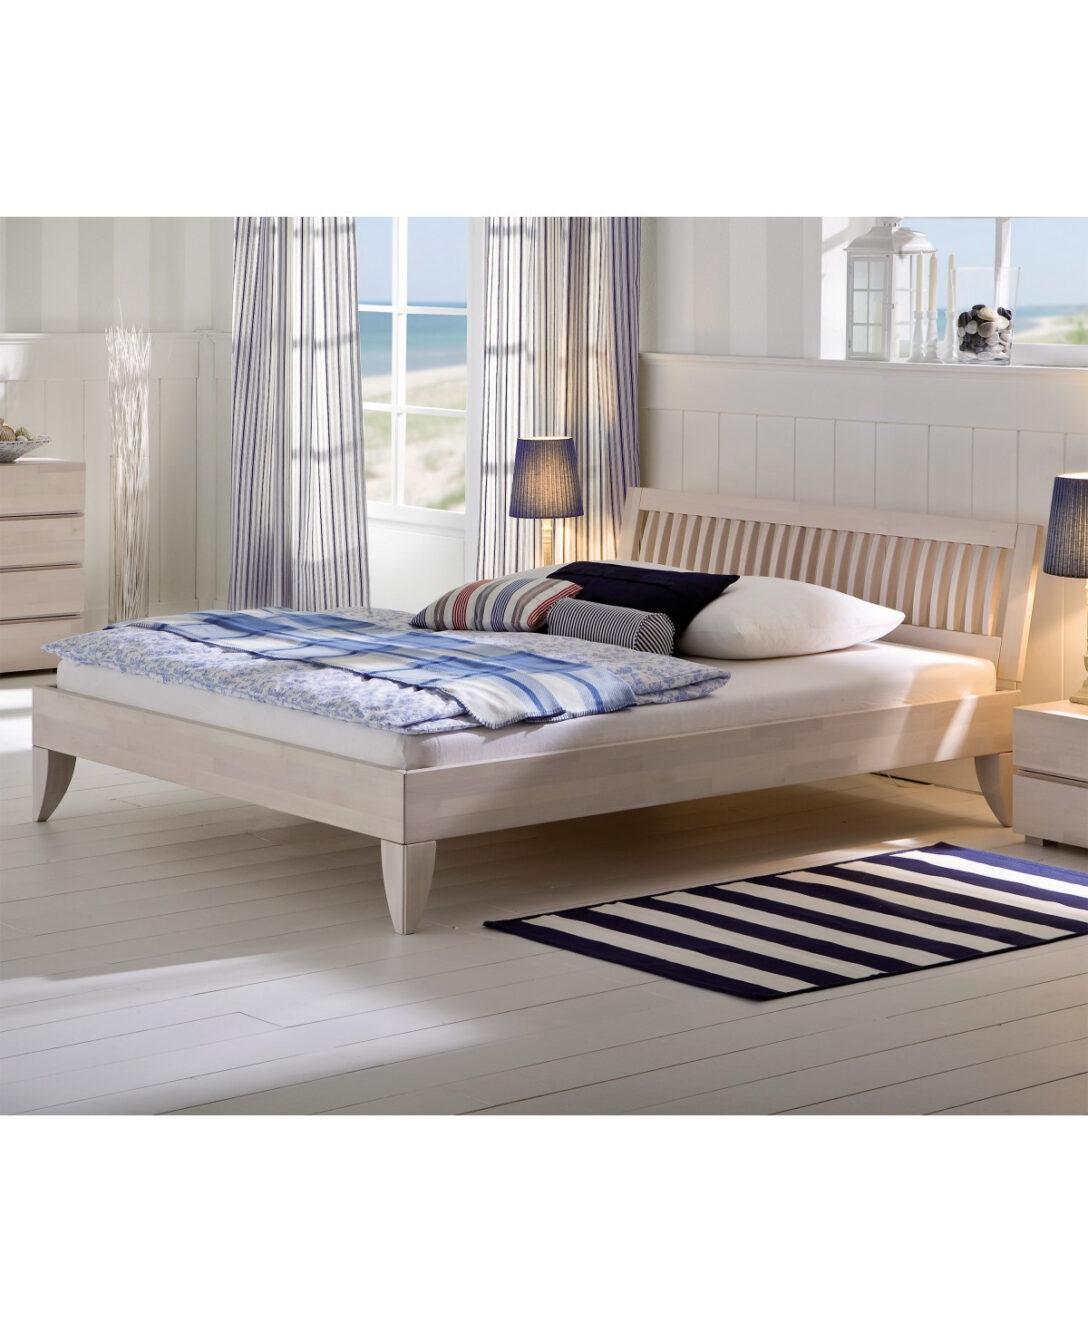 Large Size of Komplettbett 180x220 36 S8 Bett Ikea Fhrung Wohnzimmer Komplettbett 180x220